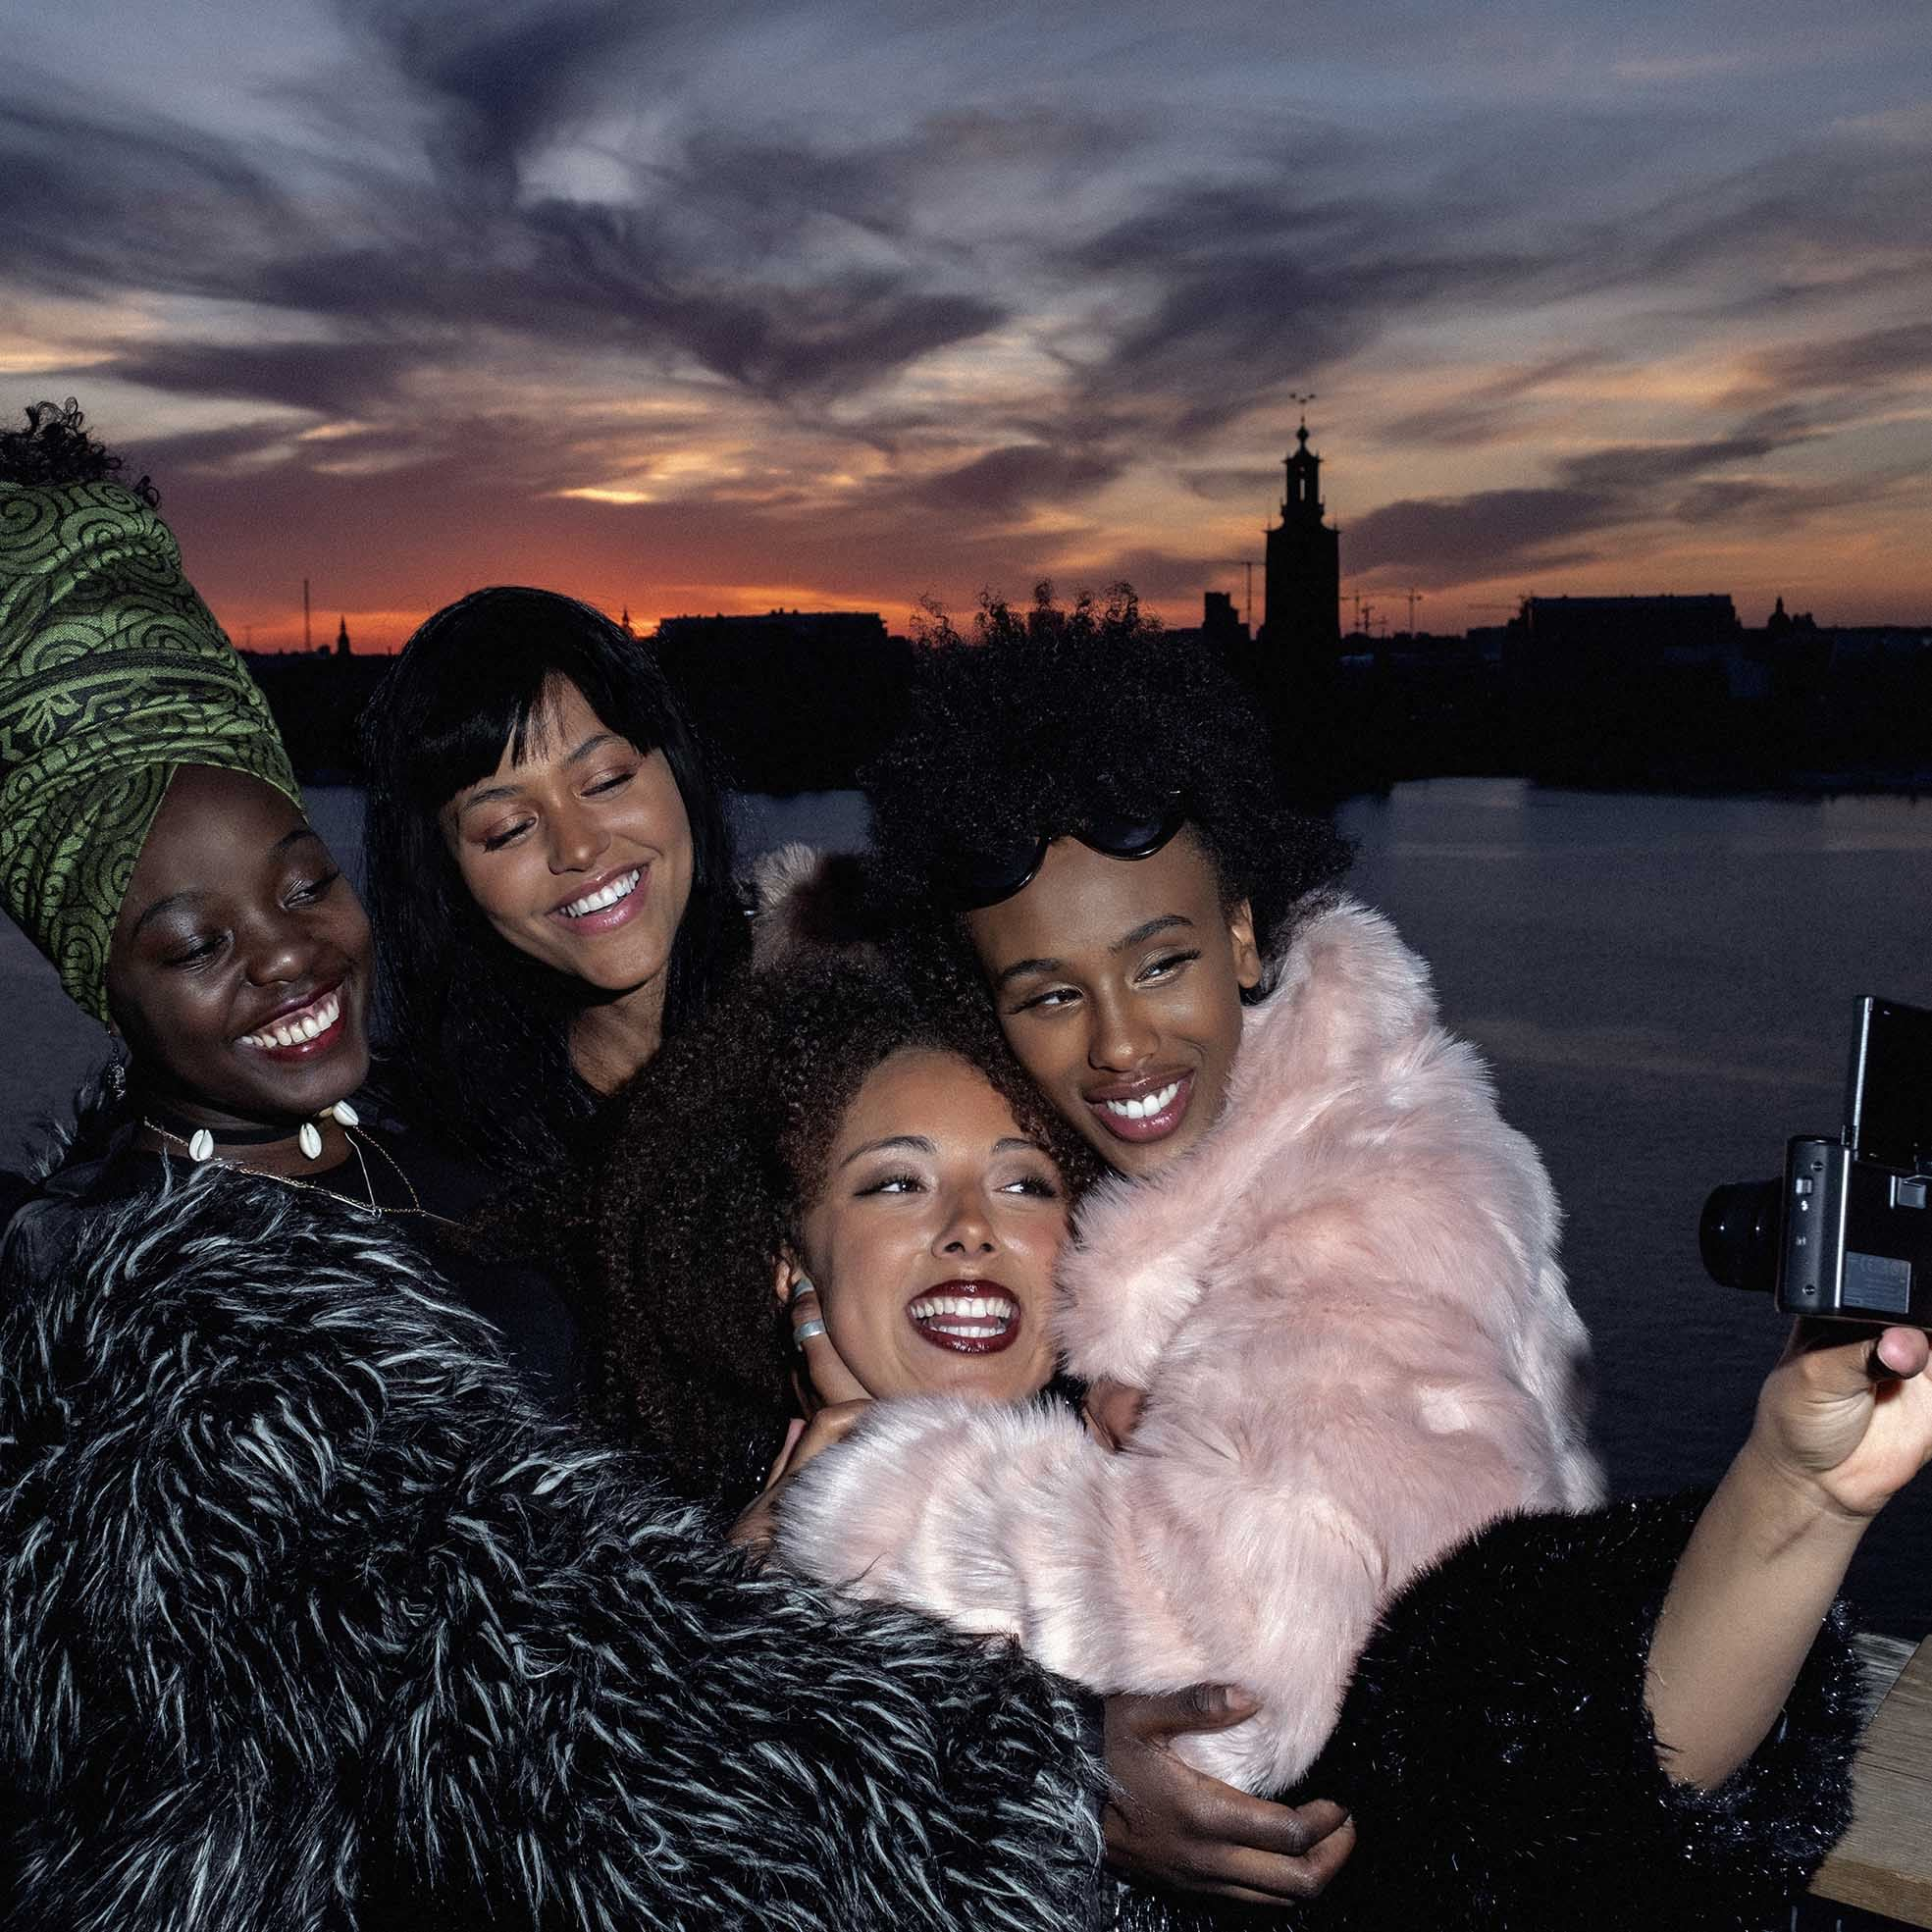 24 Timmar svart kvinna